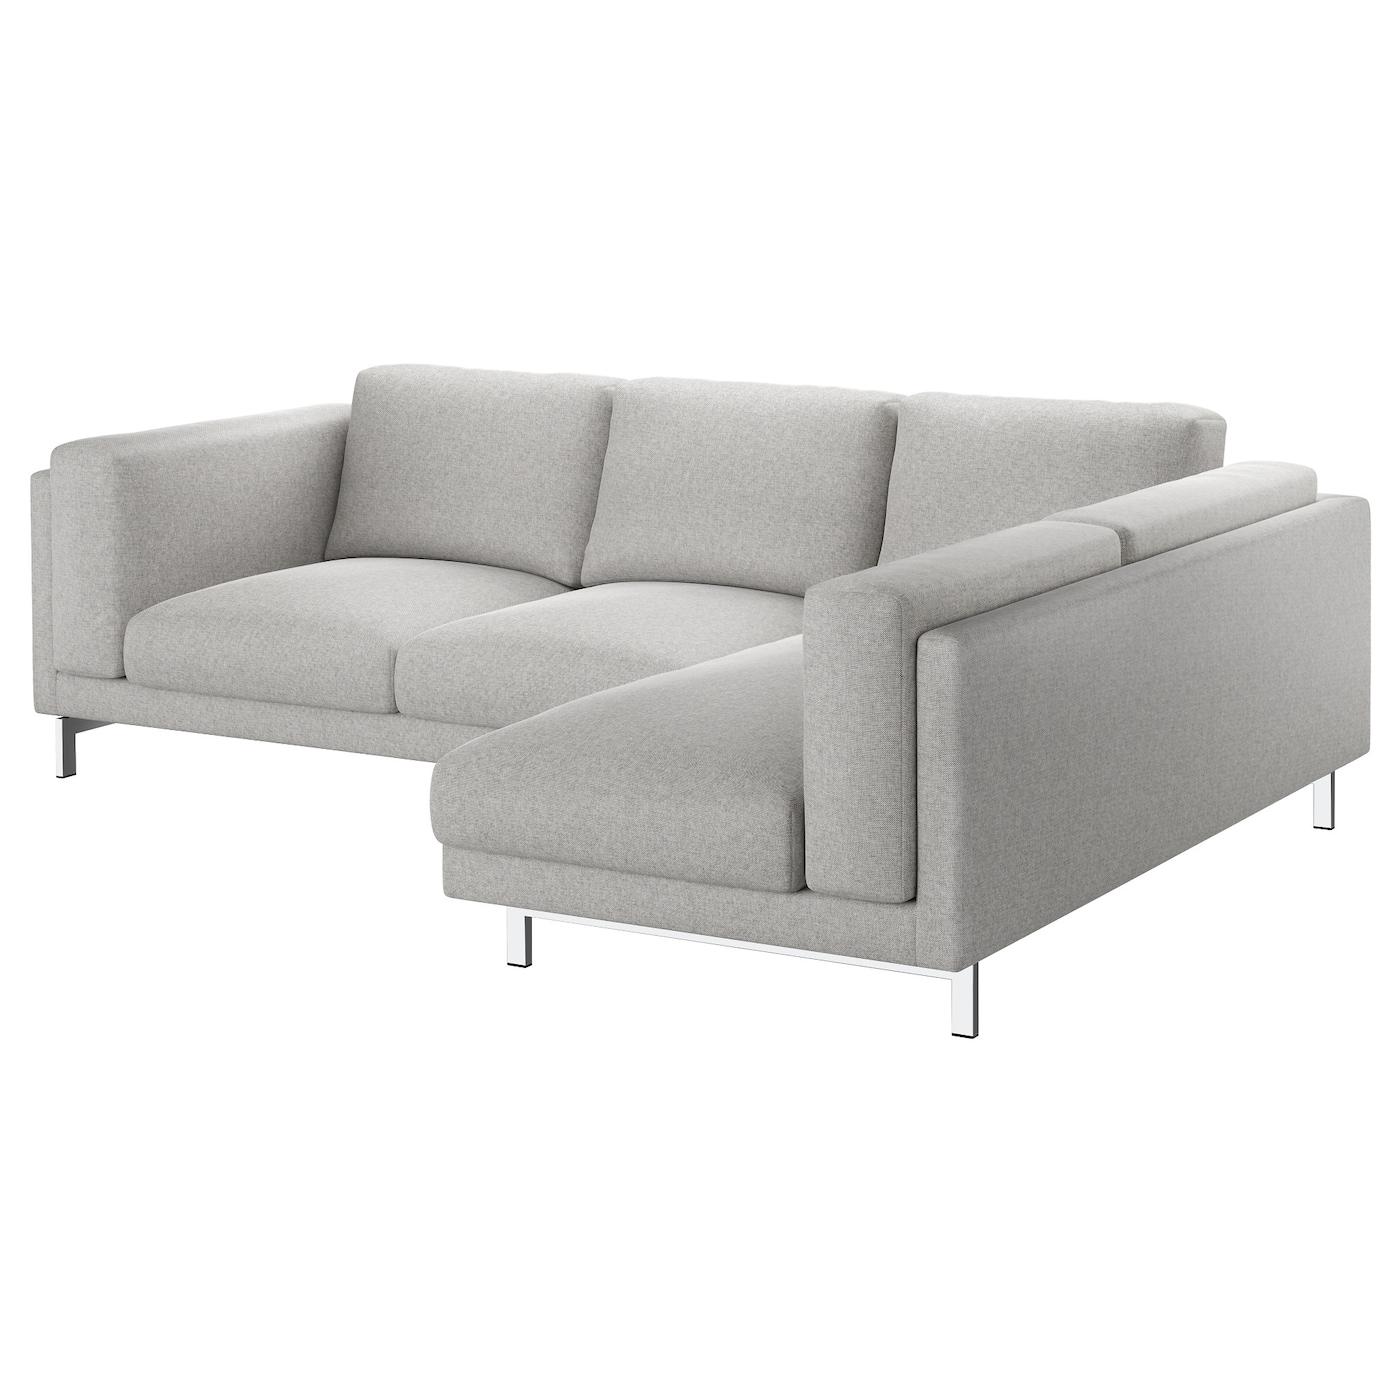 Nockeby Sofa Review Uk Baci Living Room